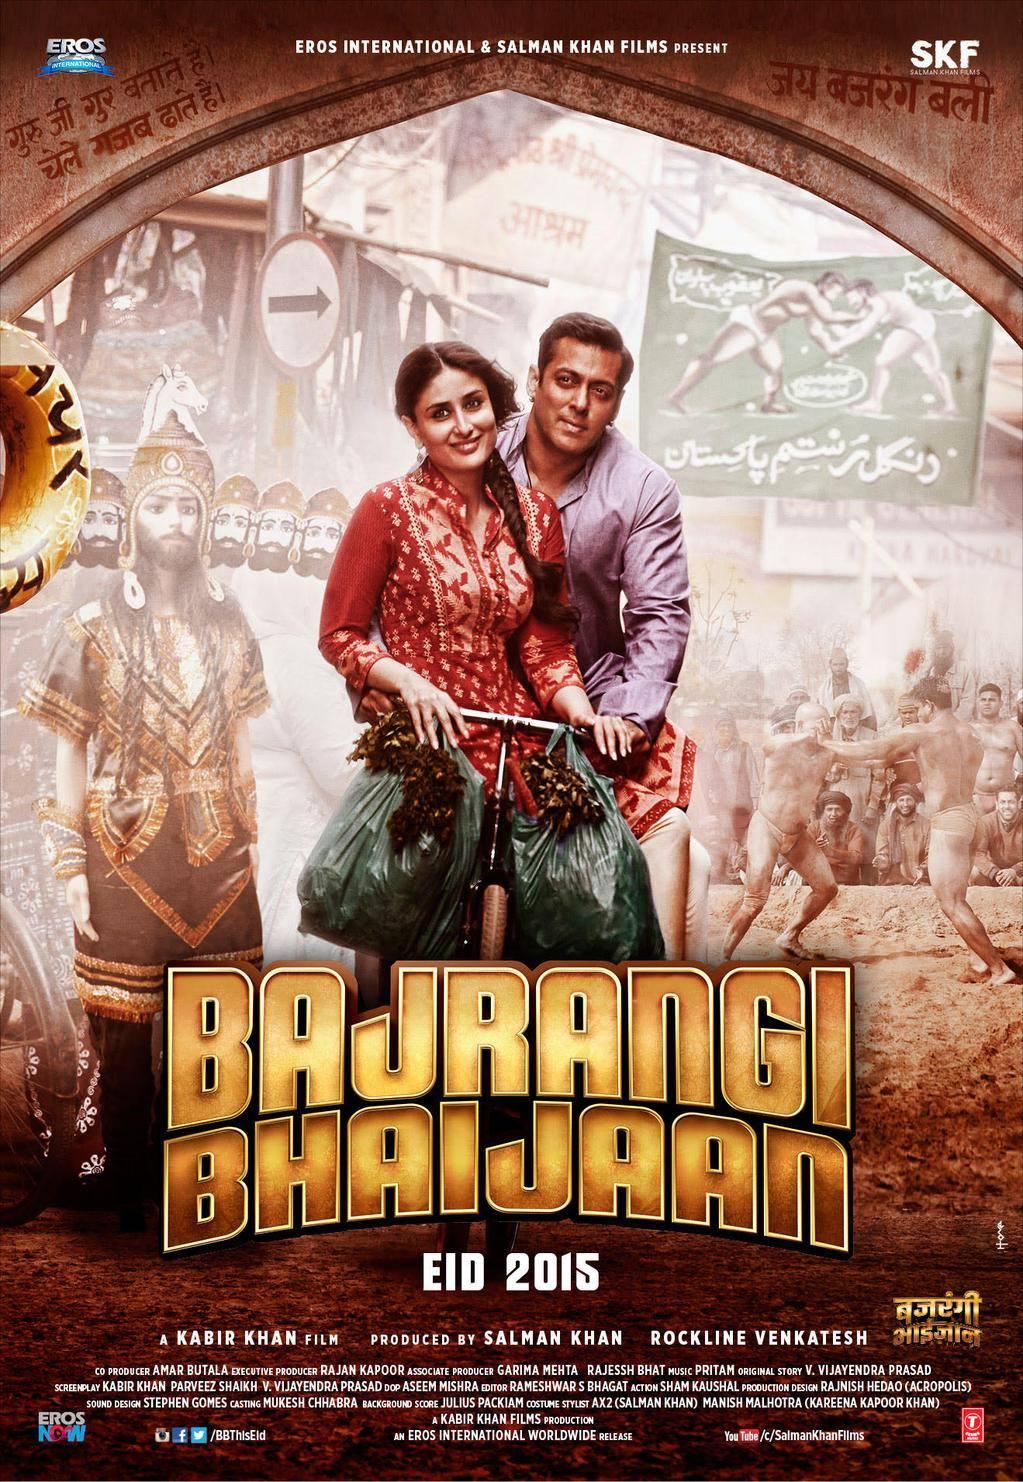 Bajrangi Bhaijaan Movie Poster Salman Khan, Kareena Kapoor